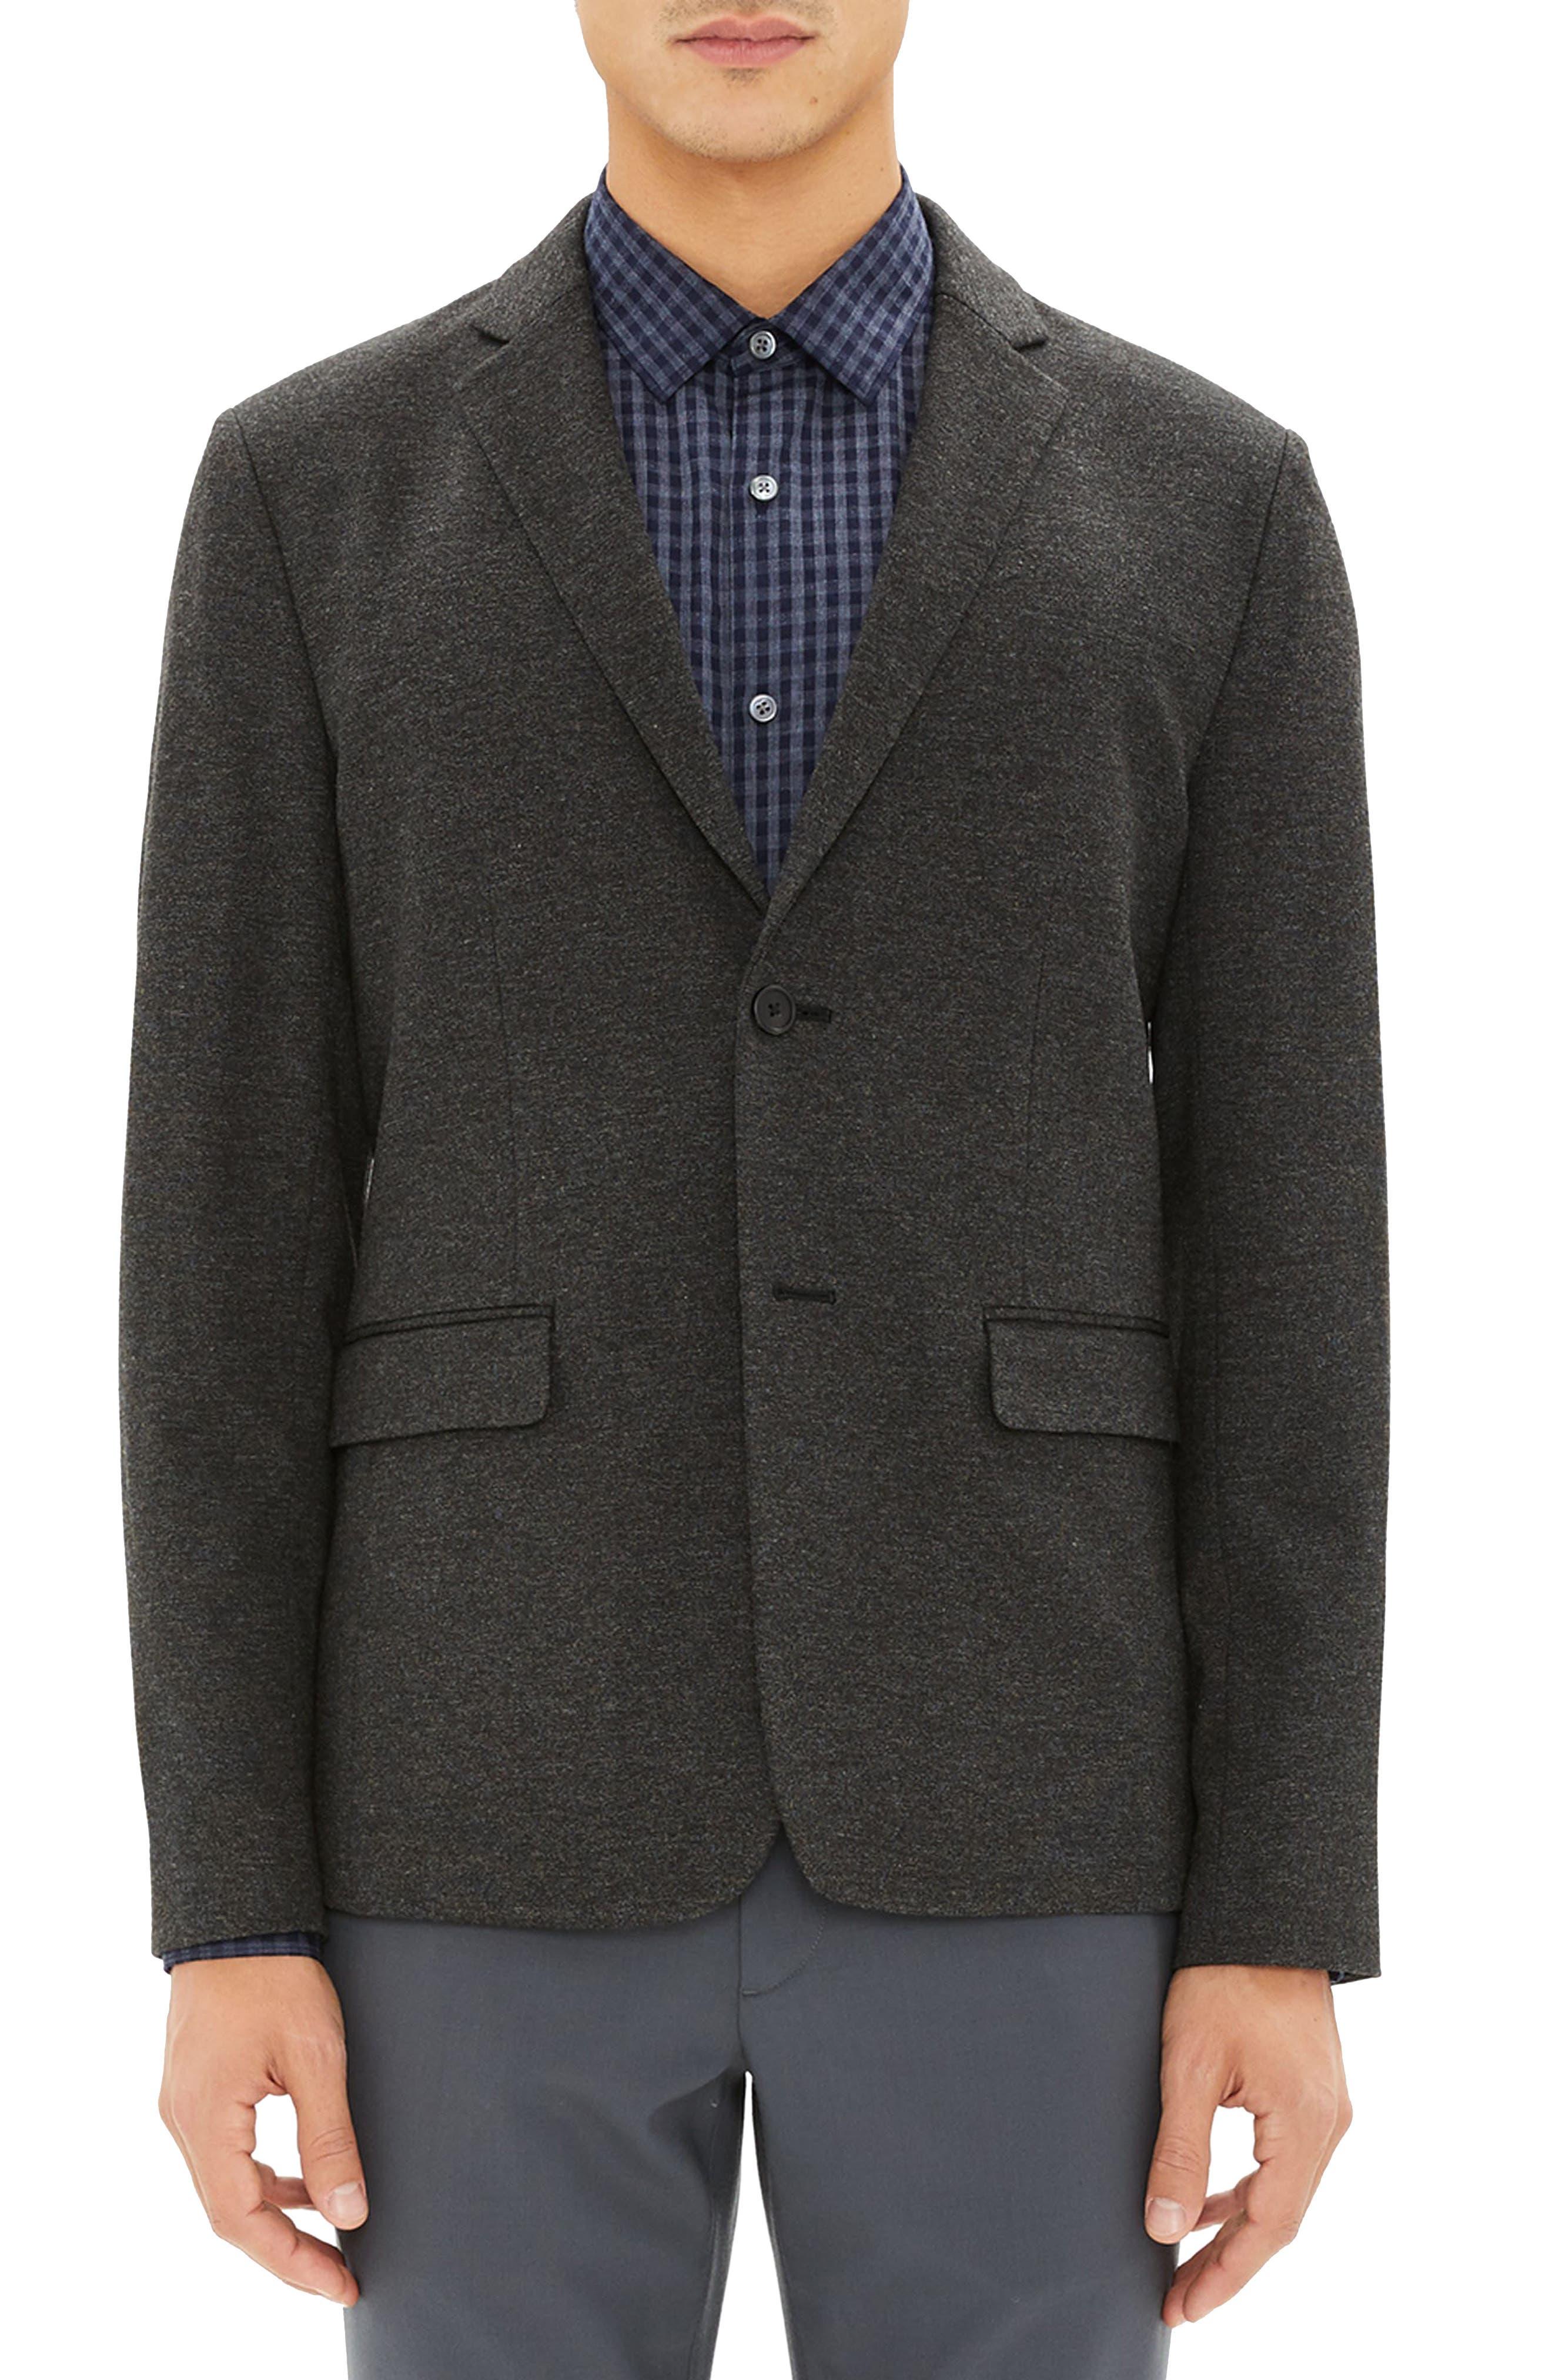 Clinton Marled Ponte Sport Coat,                         Main,                         color, DARK CHARCOAL MELANGE